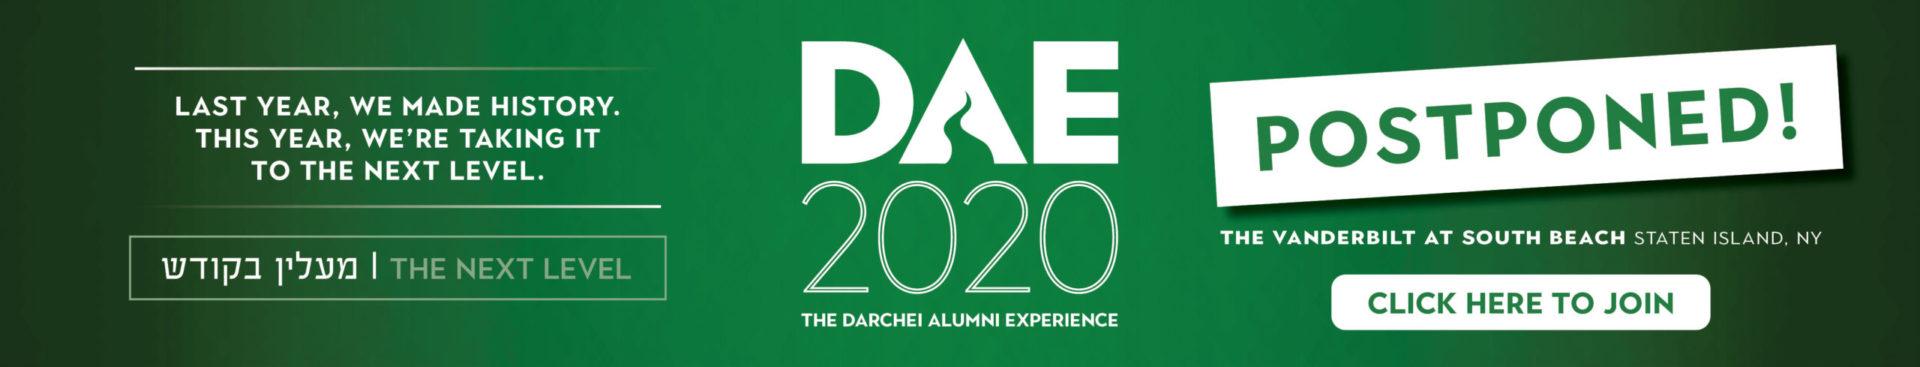 DT DAE2020 Postponed